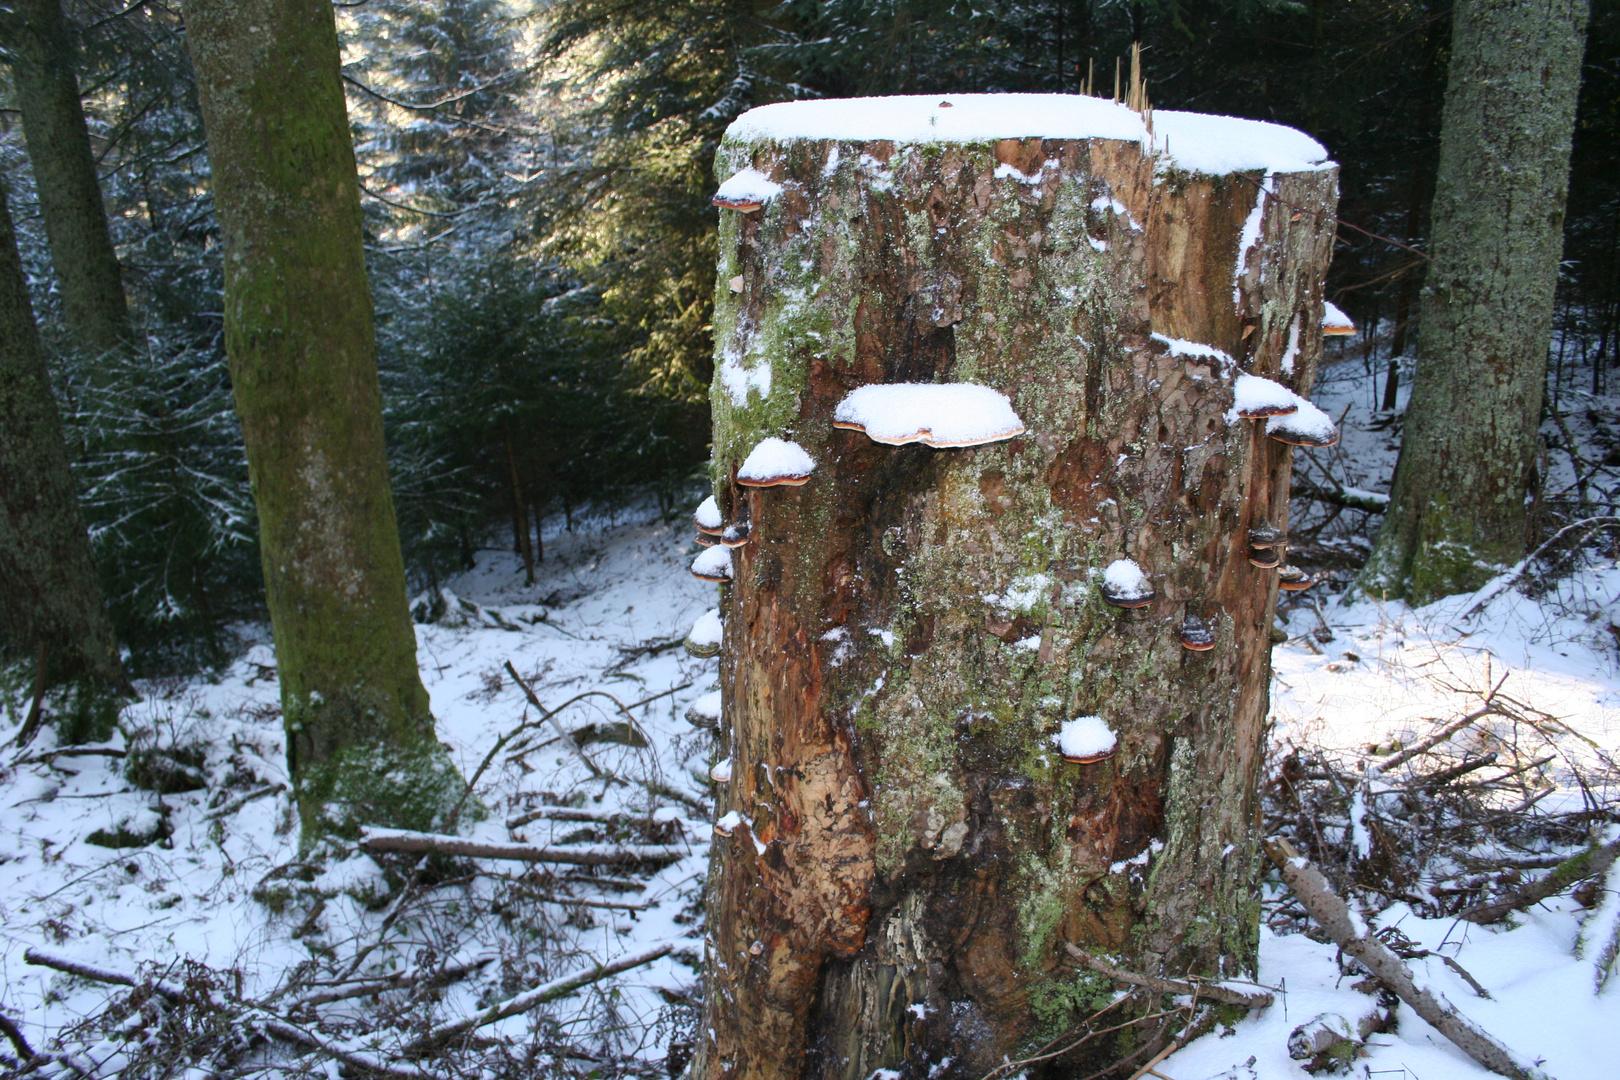 baumstamm pilze foto bild pflanzen pilze flechten pflanzen im winter schwarzwald bilder. Black Bedroom Furniture Sets. Home Design Ideas